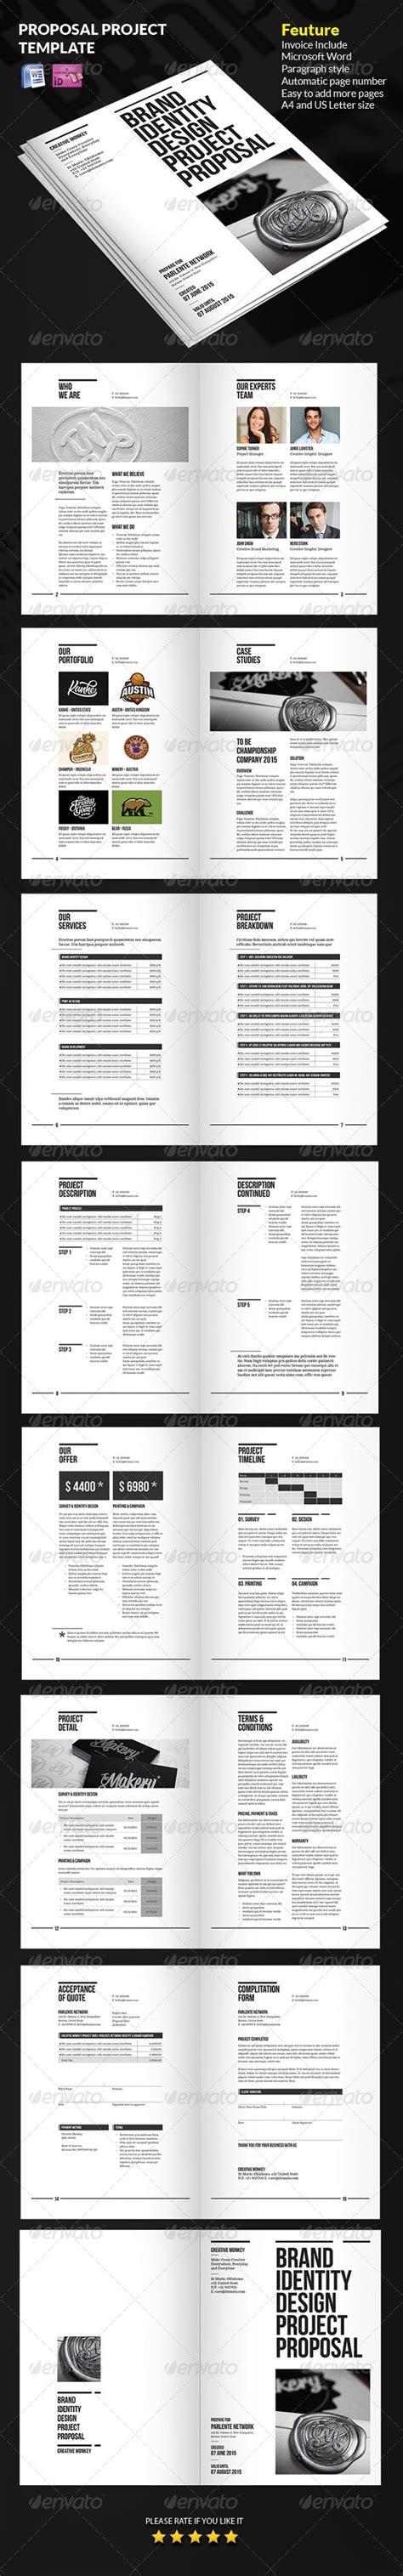 design proposal font 122 best images about business proposals on pinterest